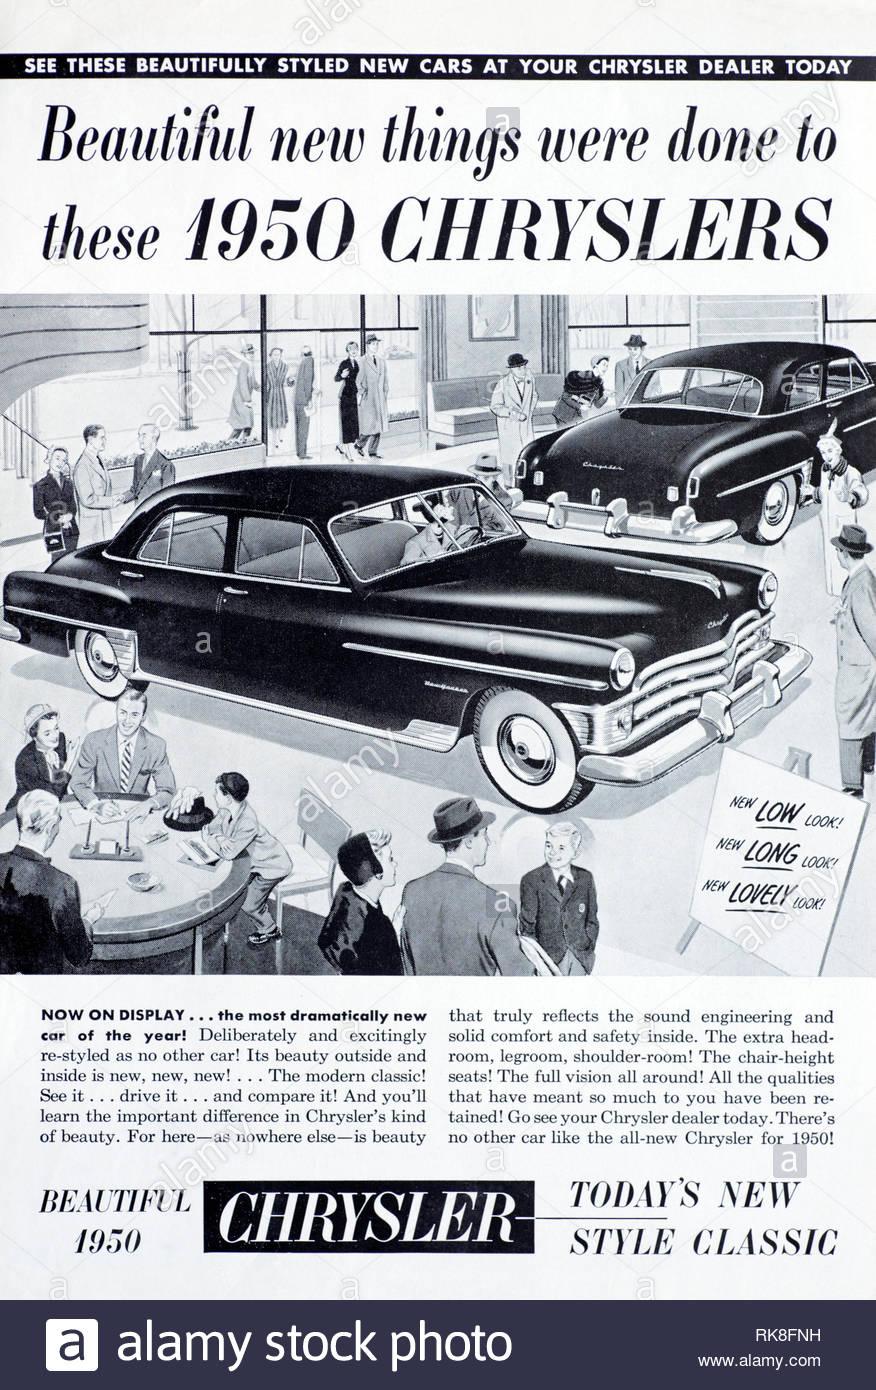 Vintage advertising for the Chrysler New Yorker Newport Car 1950 - Stock Image